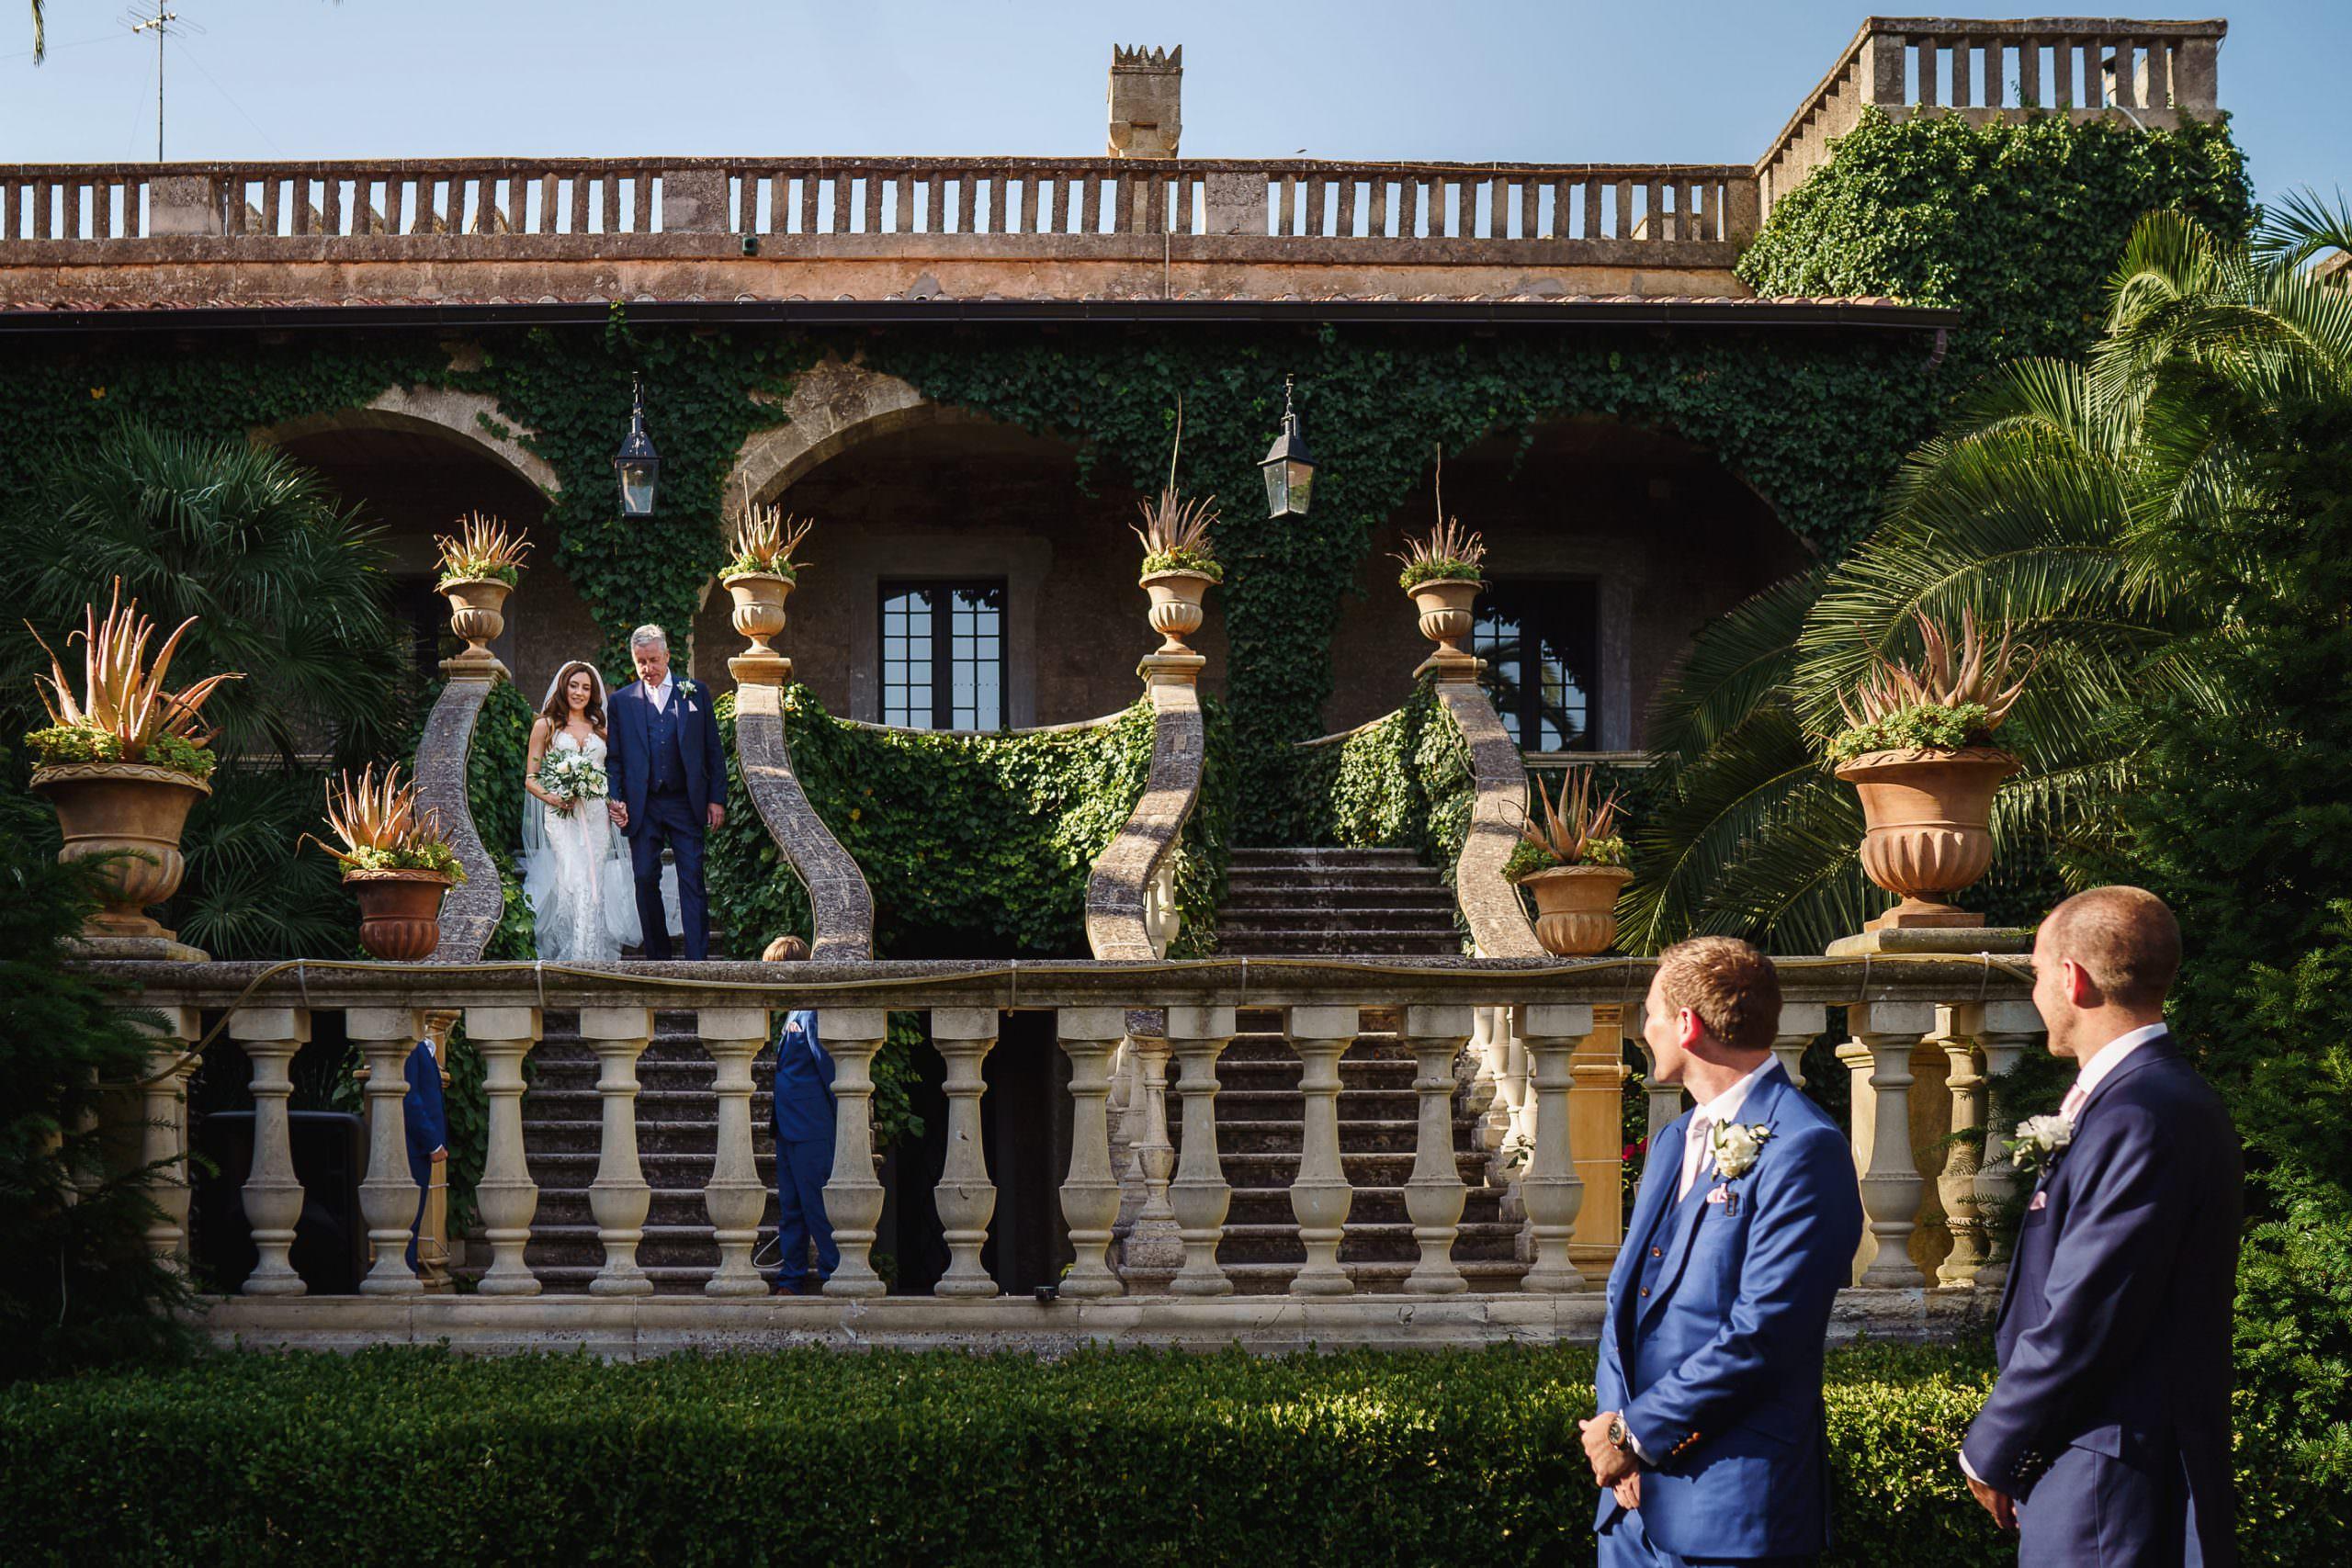 Castello Monaci outdoor wedding